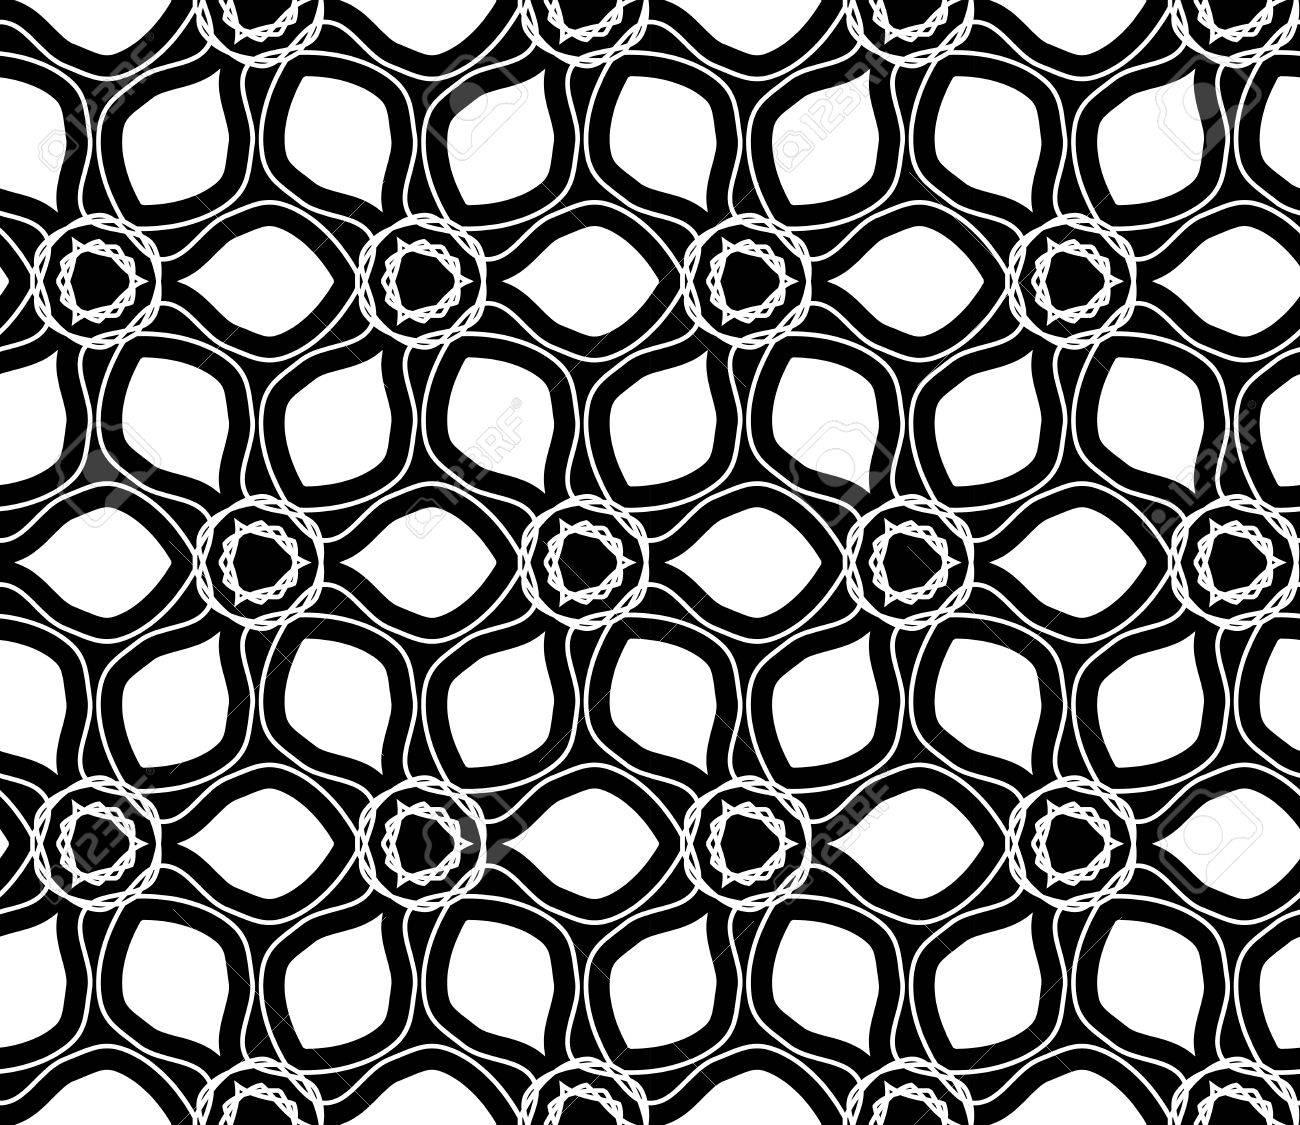 Vector Modern Seamless Geometry Drawed Floral Pattern Black